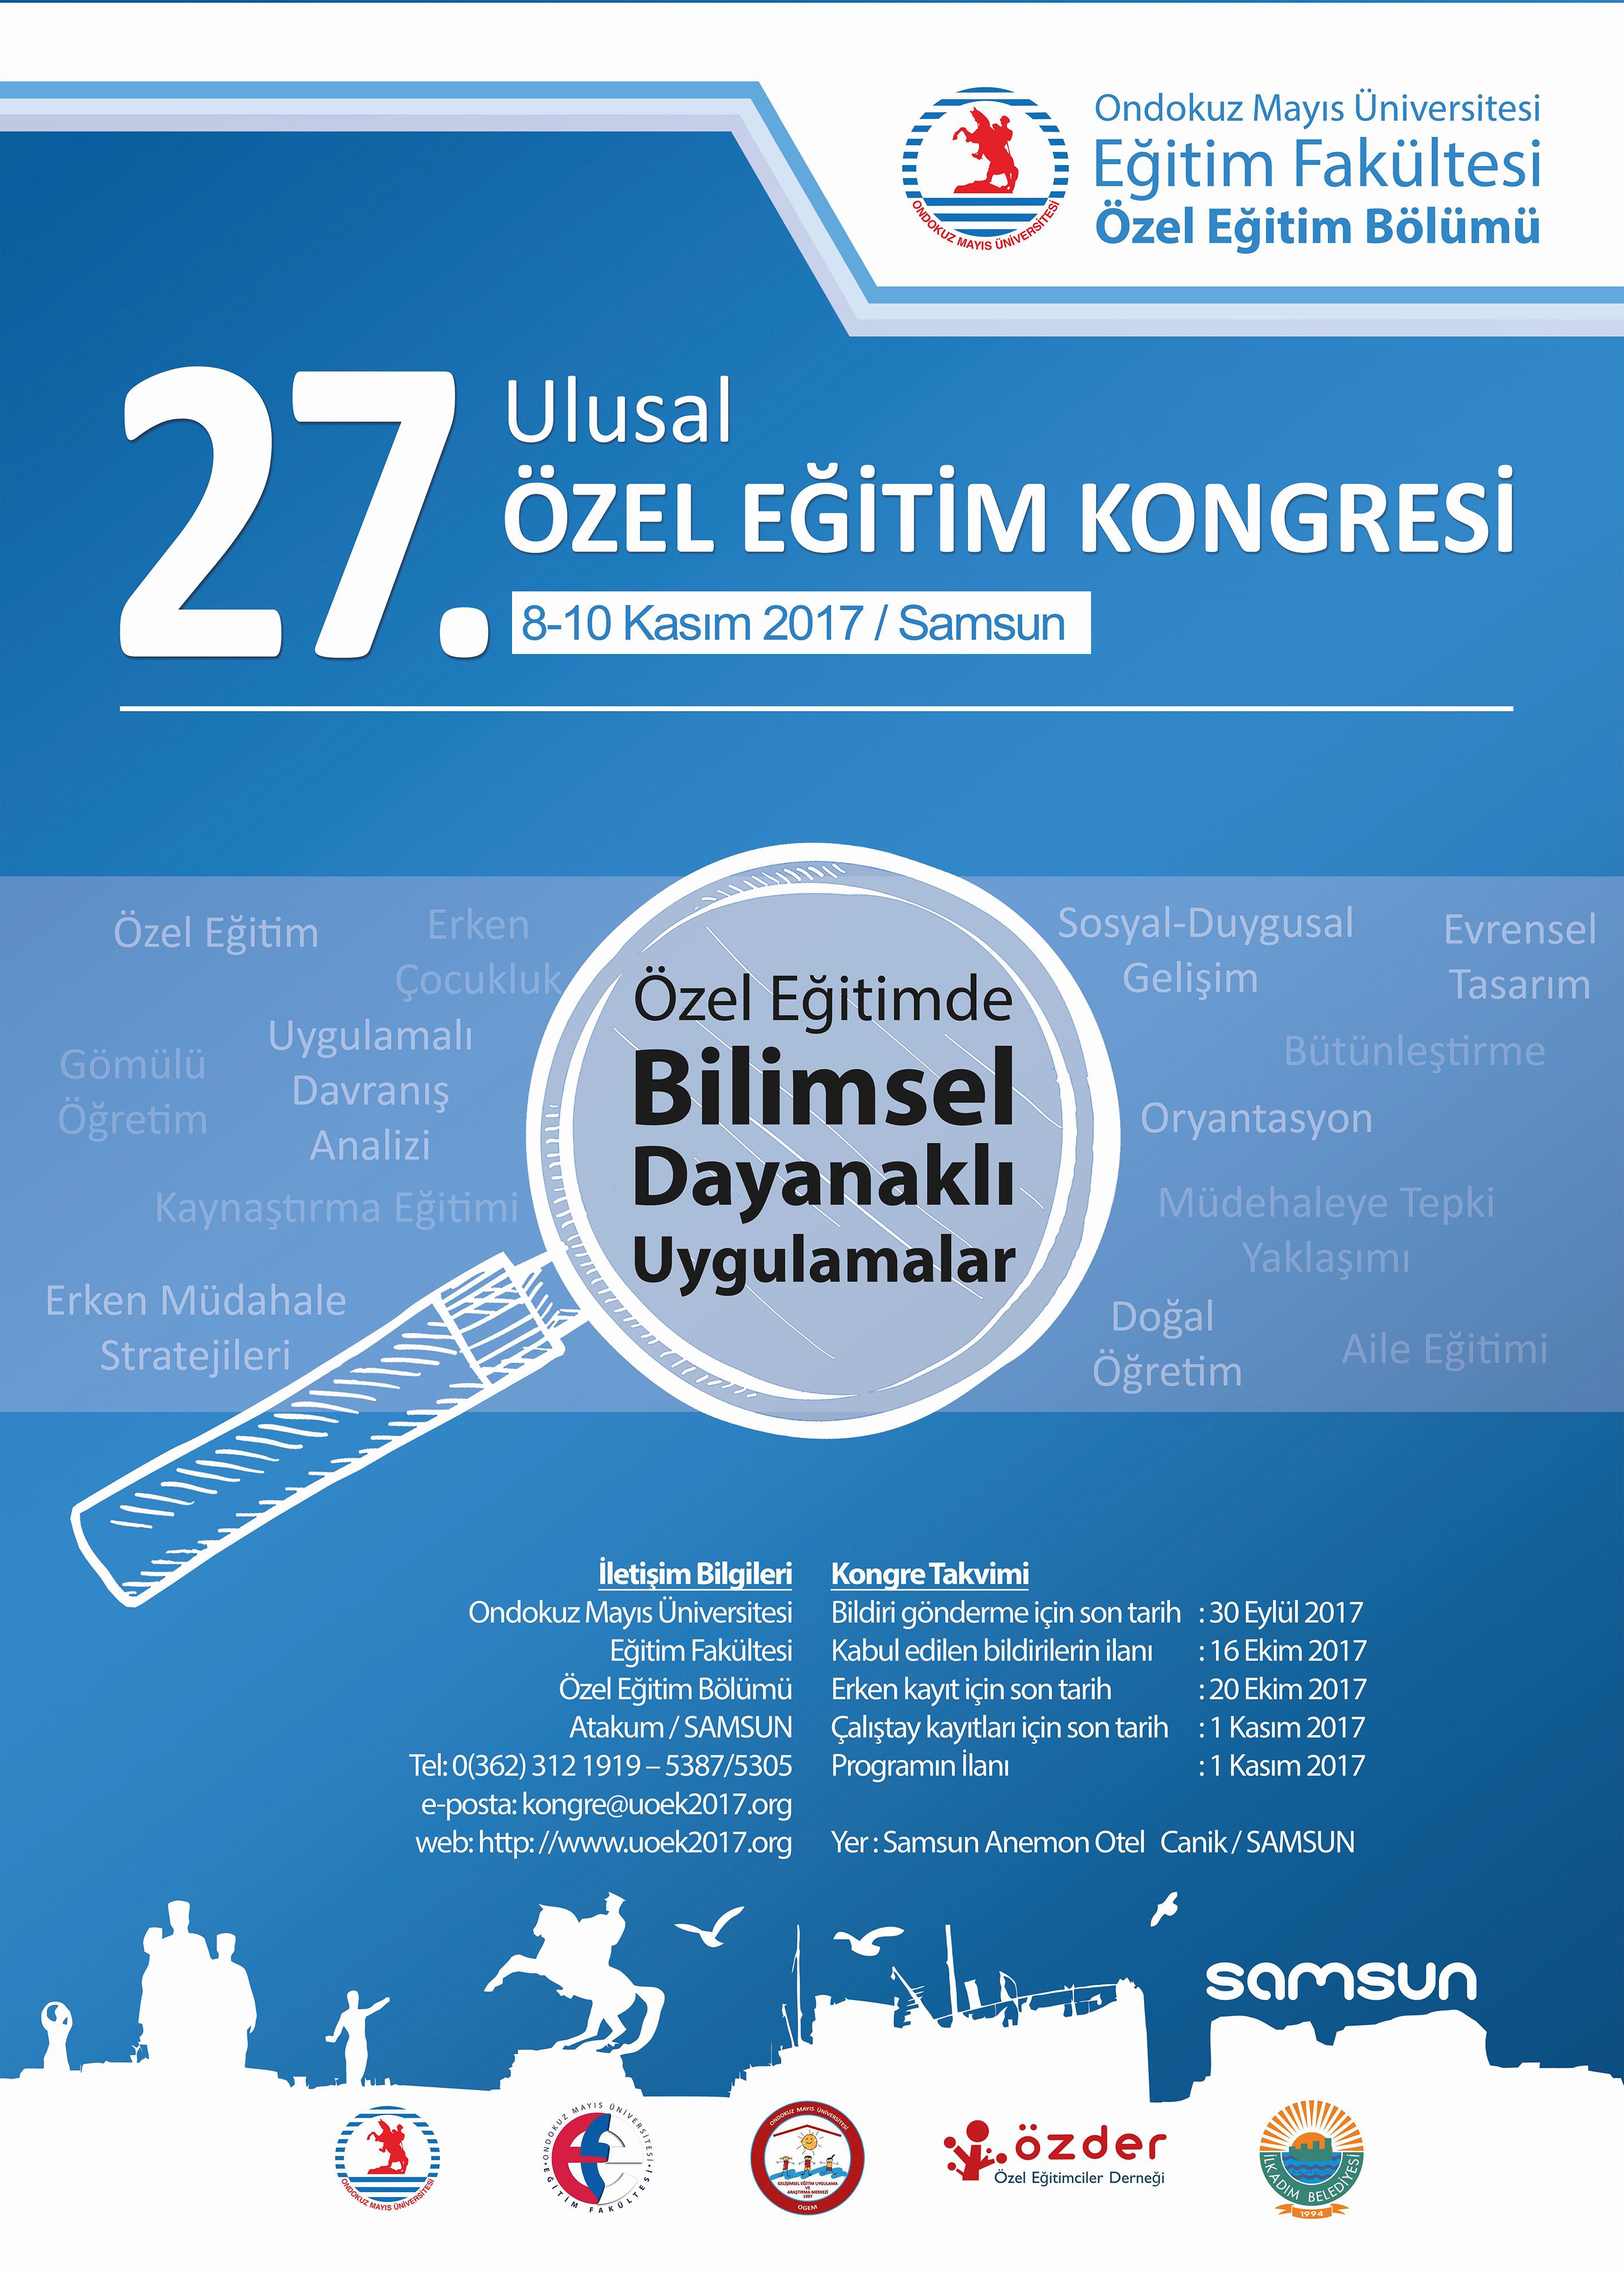 http://www.omu.edu.tr/sites/default/files/files/27._ulusla_ozel_egitim_kongresi/ozel_egitim_2017afis.jpg